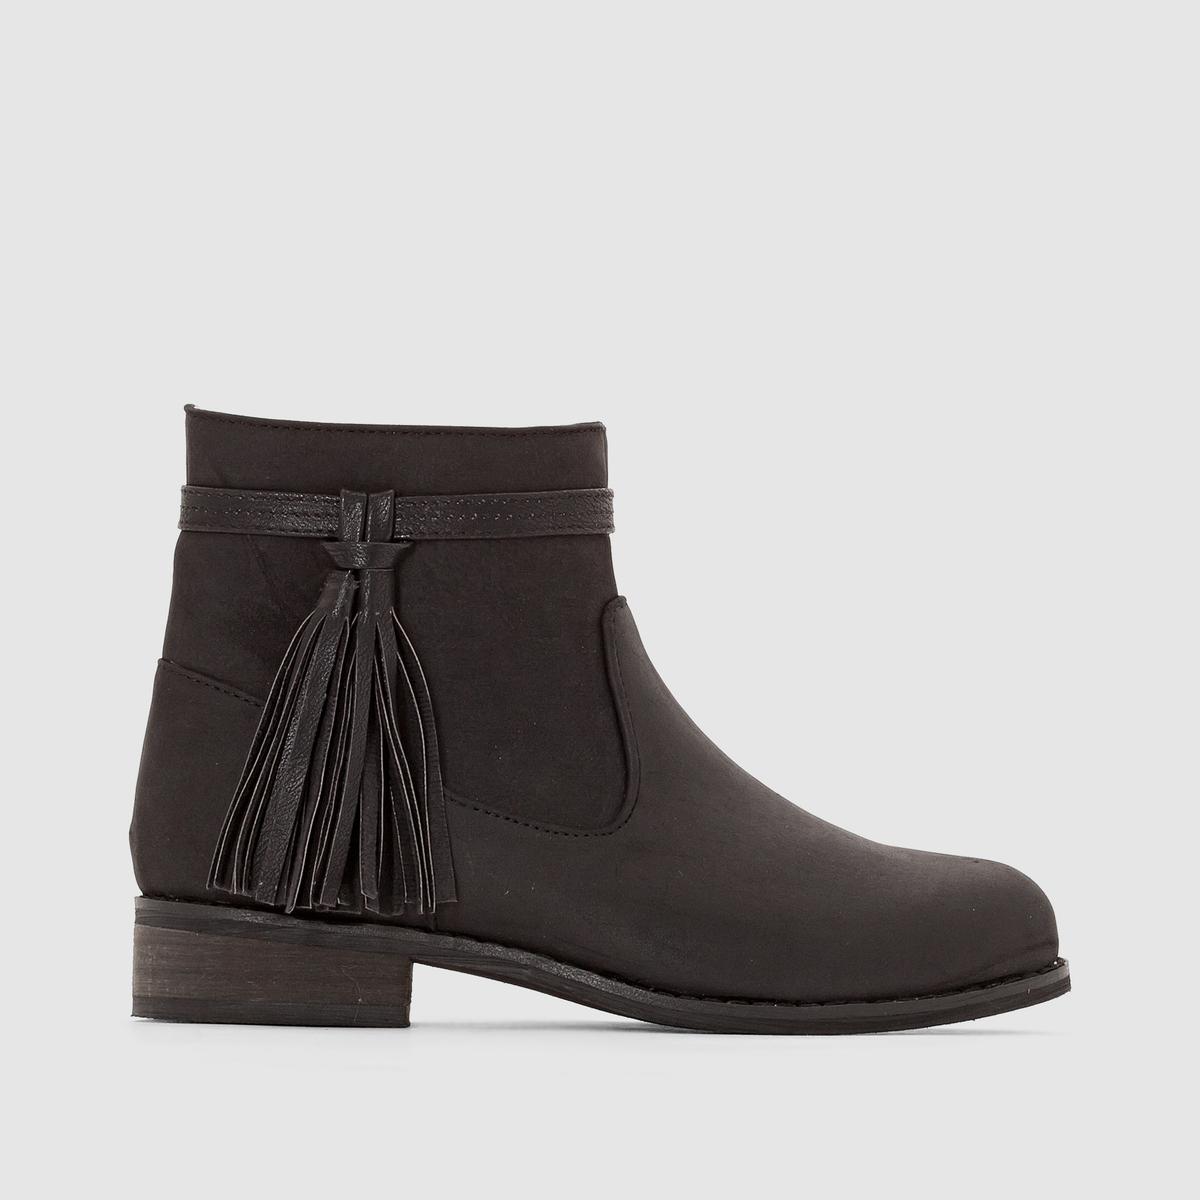 Ботинки с помпонами ботинки блестящие с помпонами 19 24